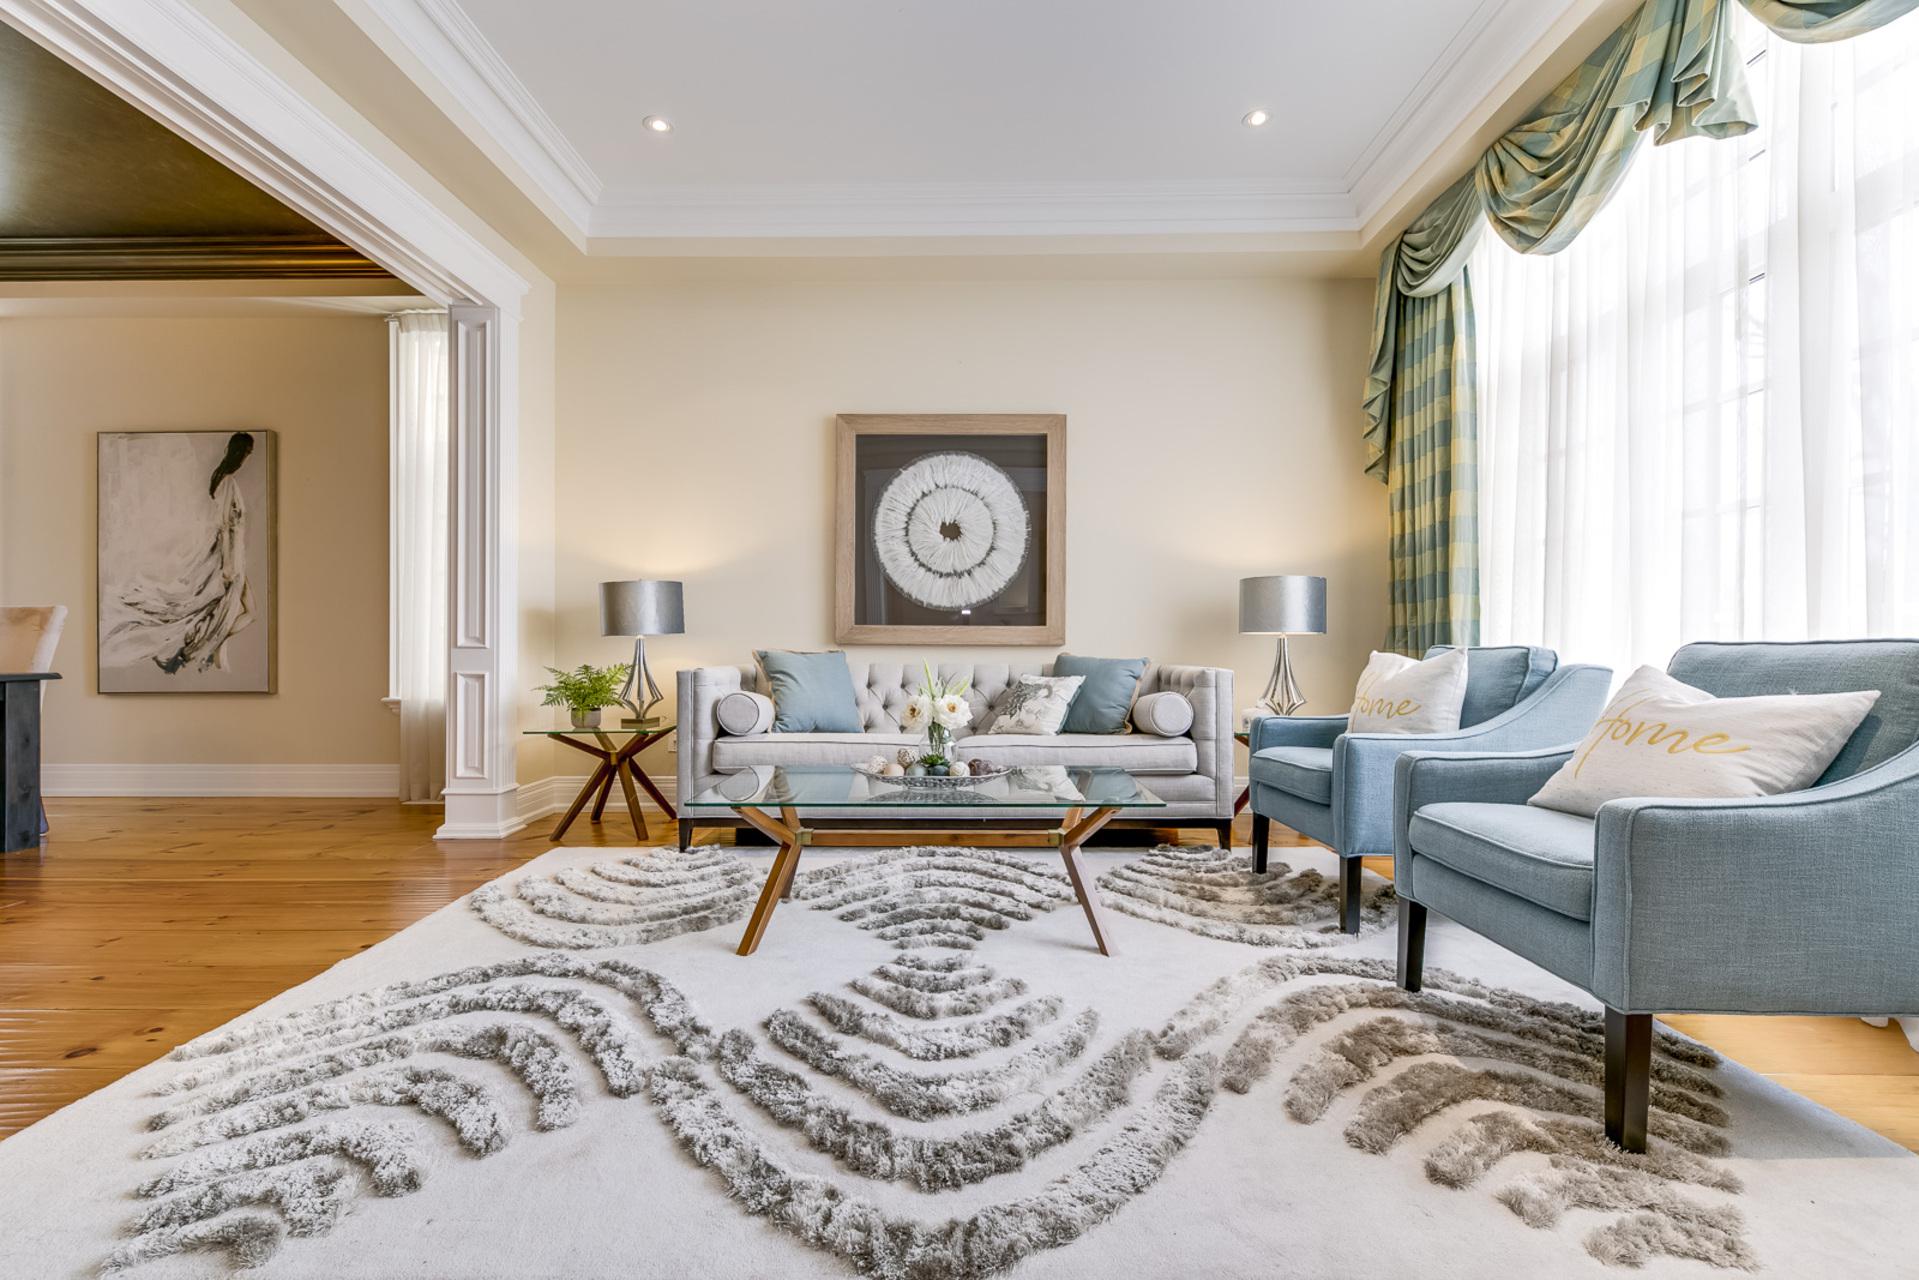 Living Room - 725 Queensway W, Mississauga - Elite3 & Team at 725 Queensway West, Erindale, Mississauga